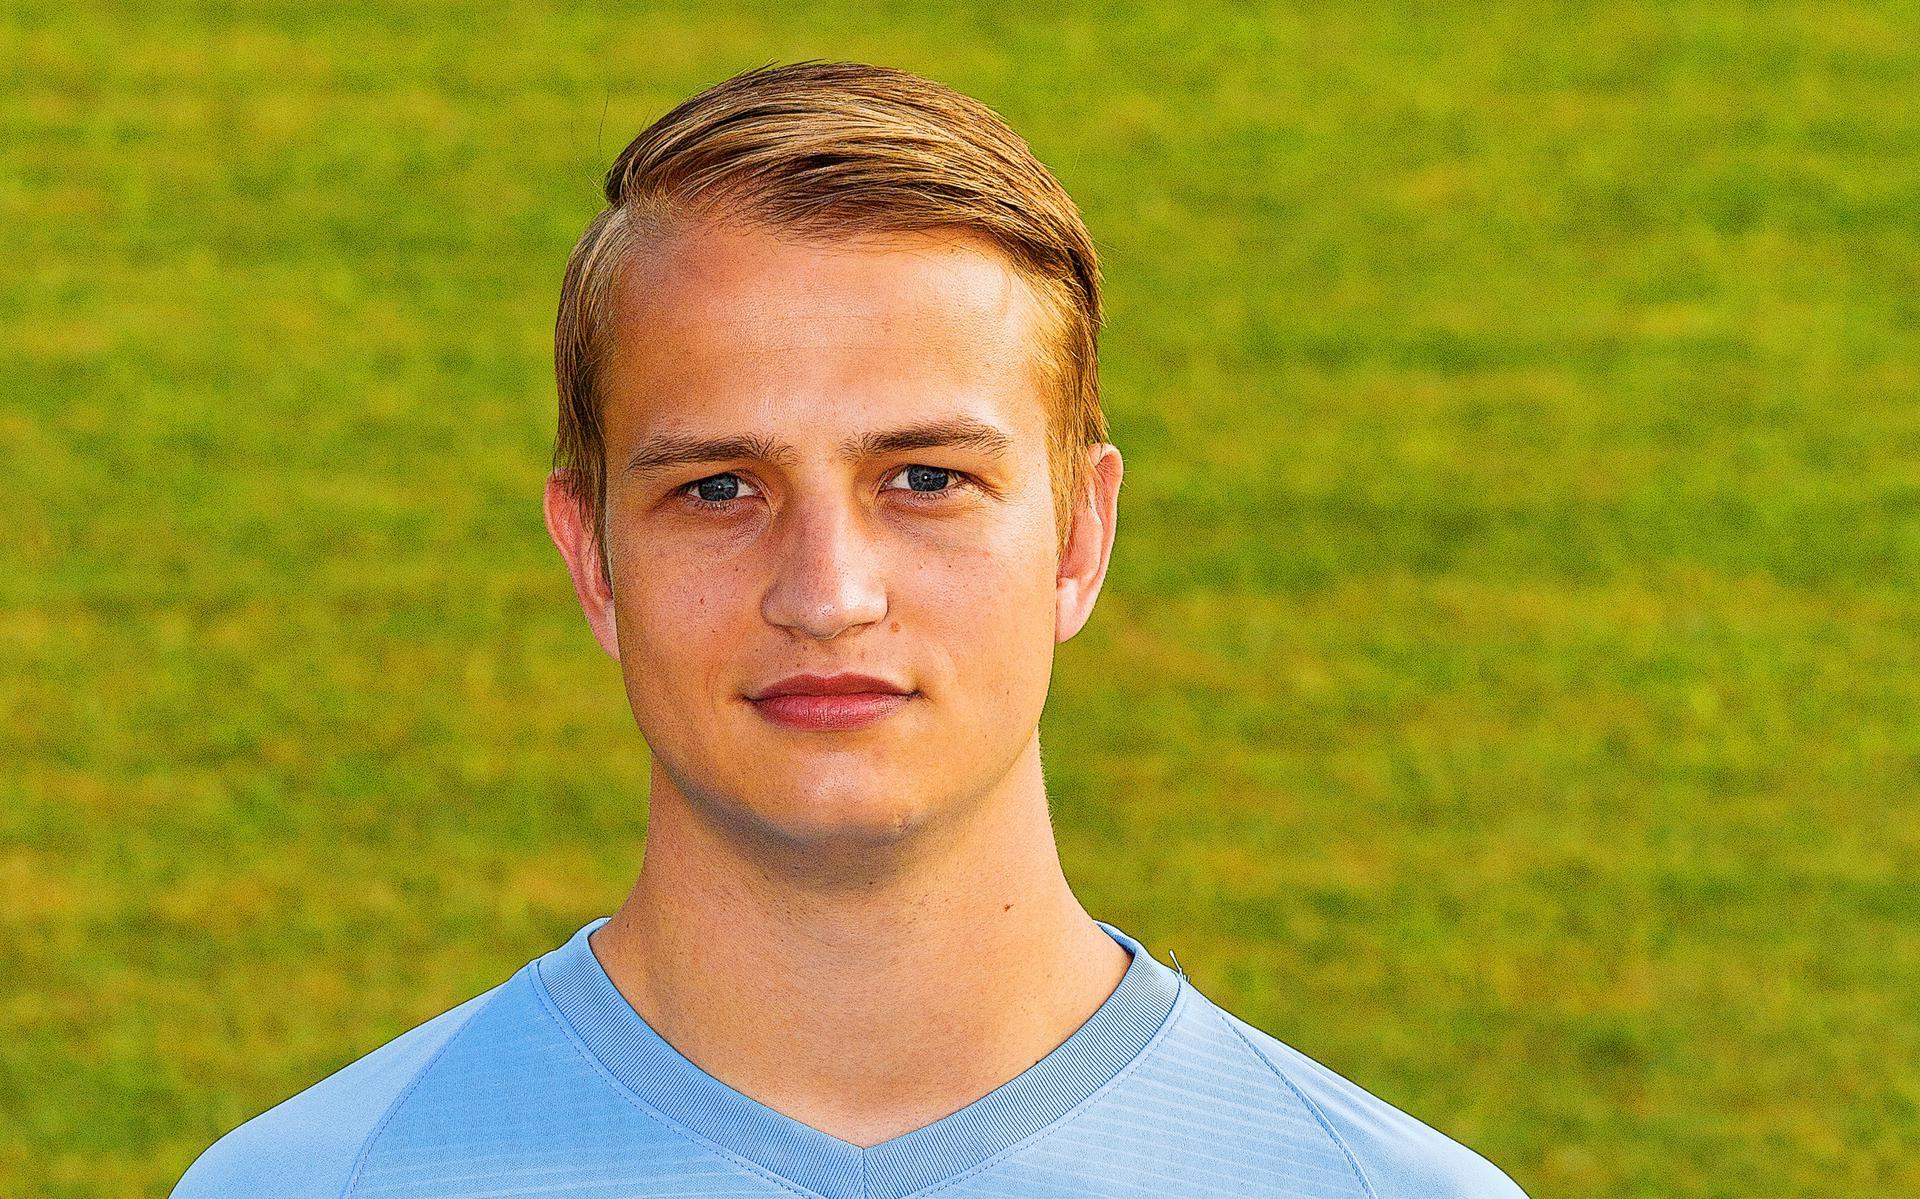 Goalkeeper Jørn Jan van de Bild moves from HHC Hardenberg to Hoogeveen